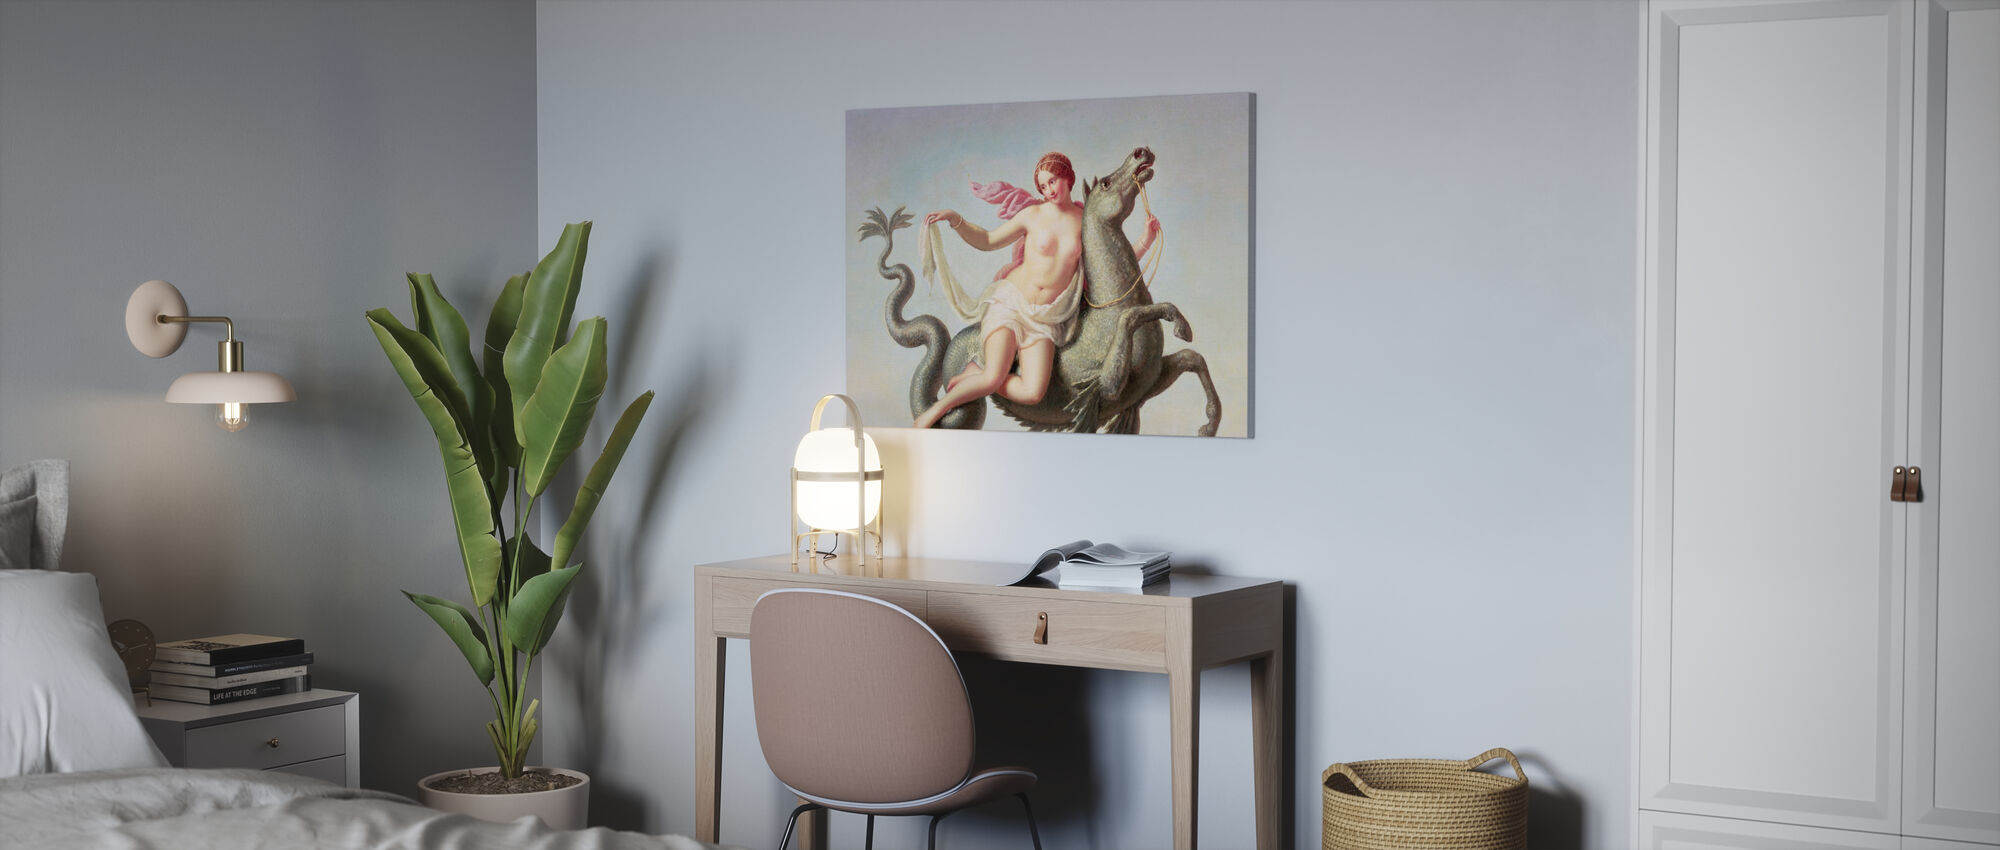 Galatean paeta - Michelangelo Maestri - Canvastaulu - Toimisto